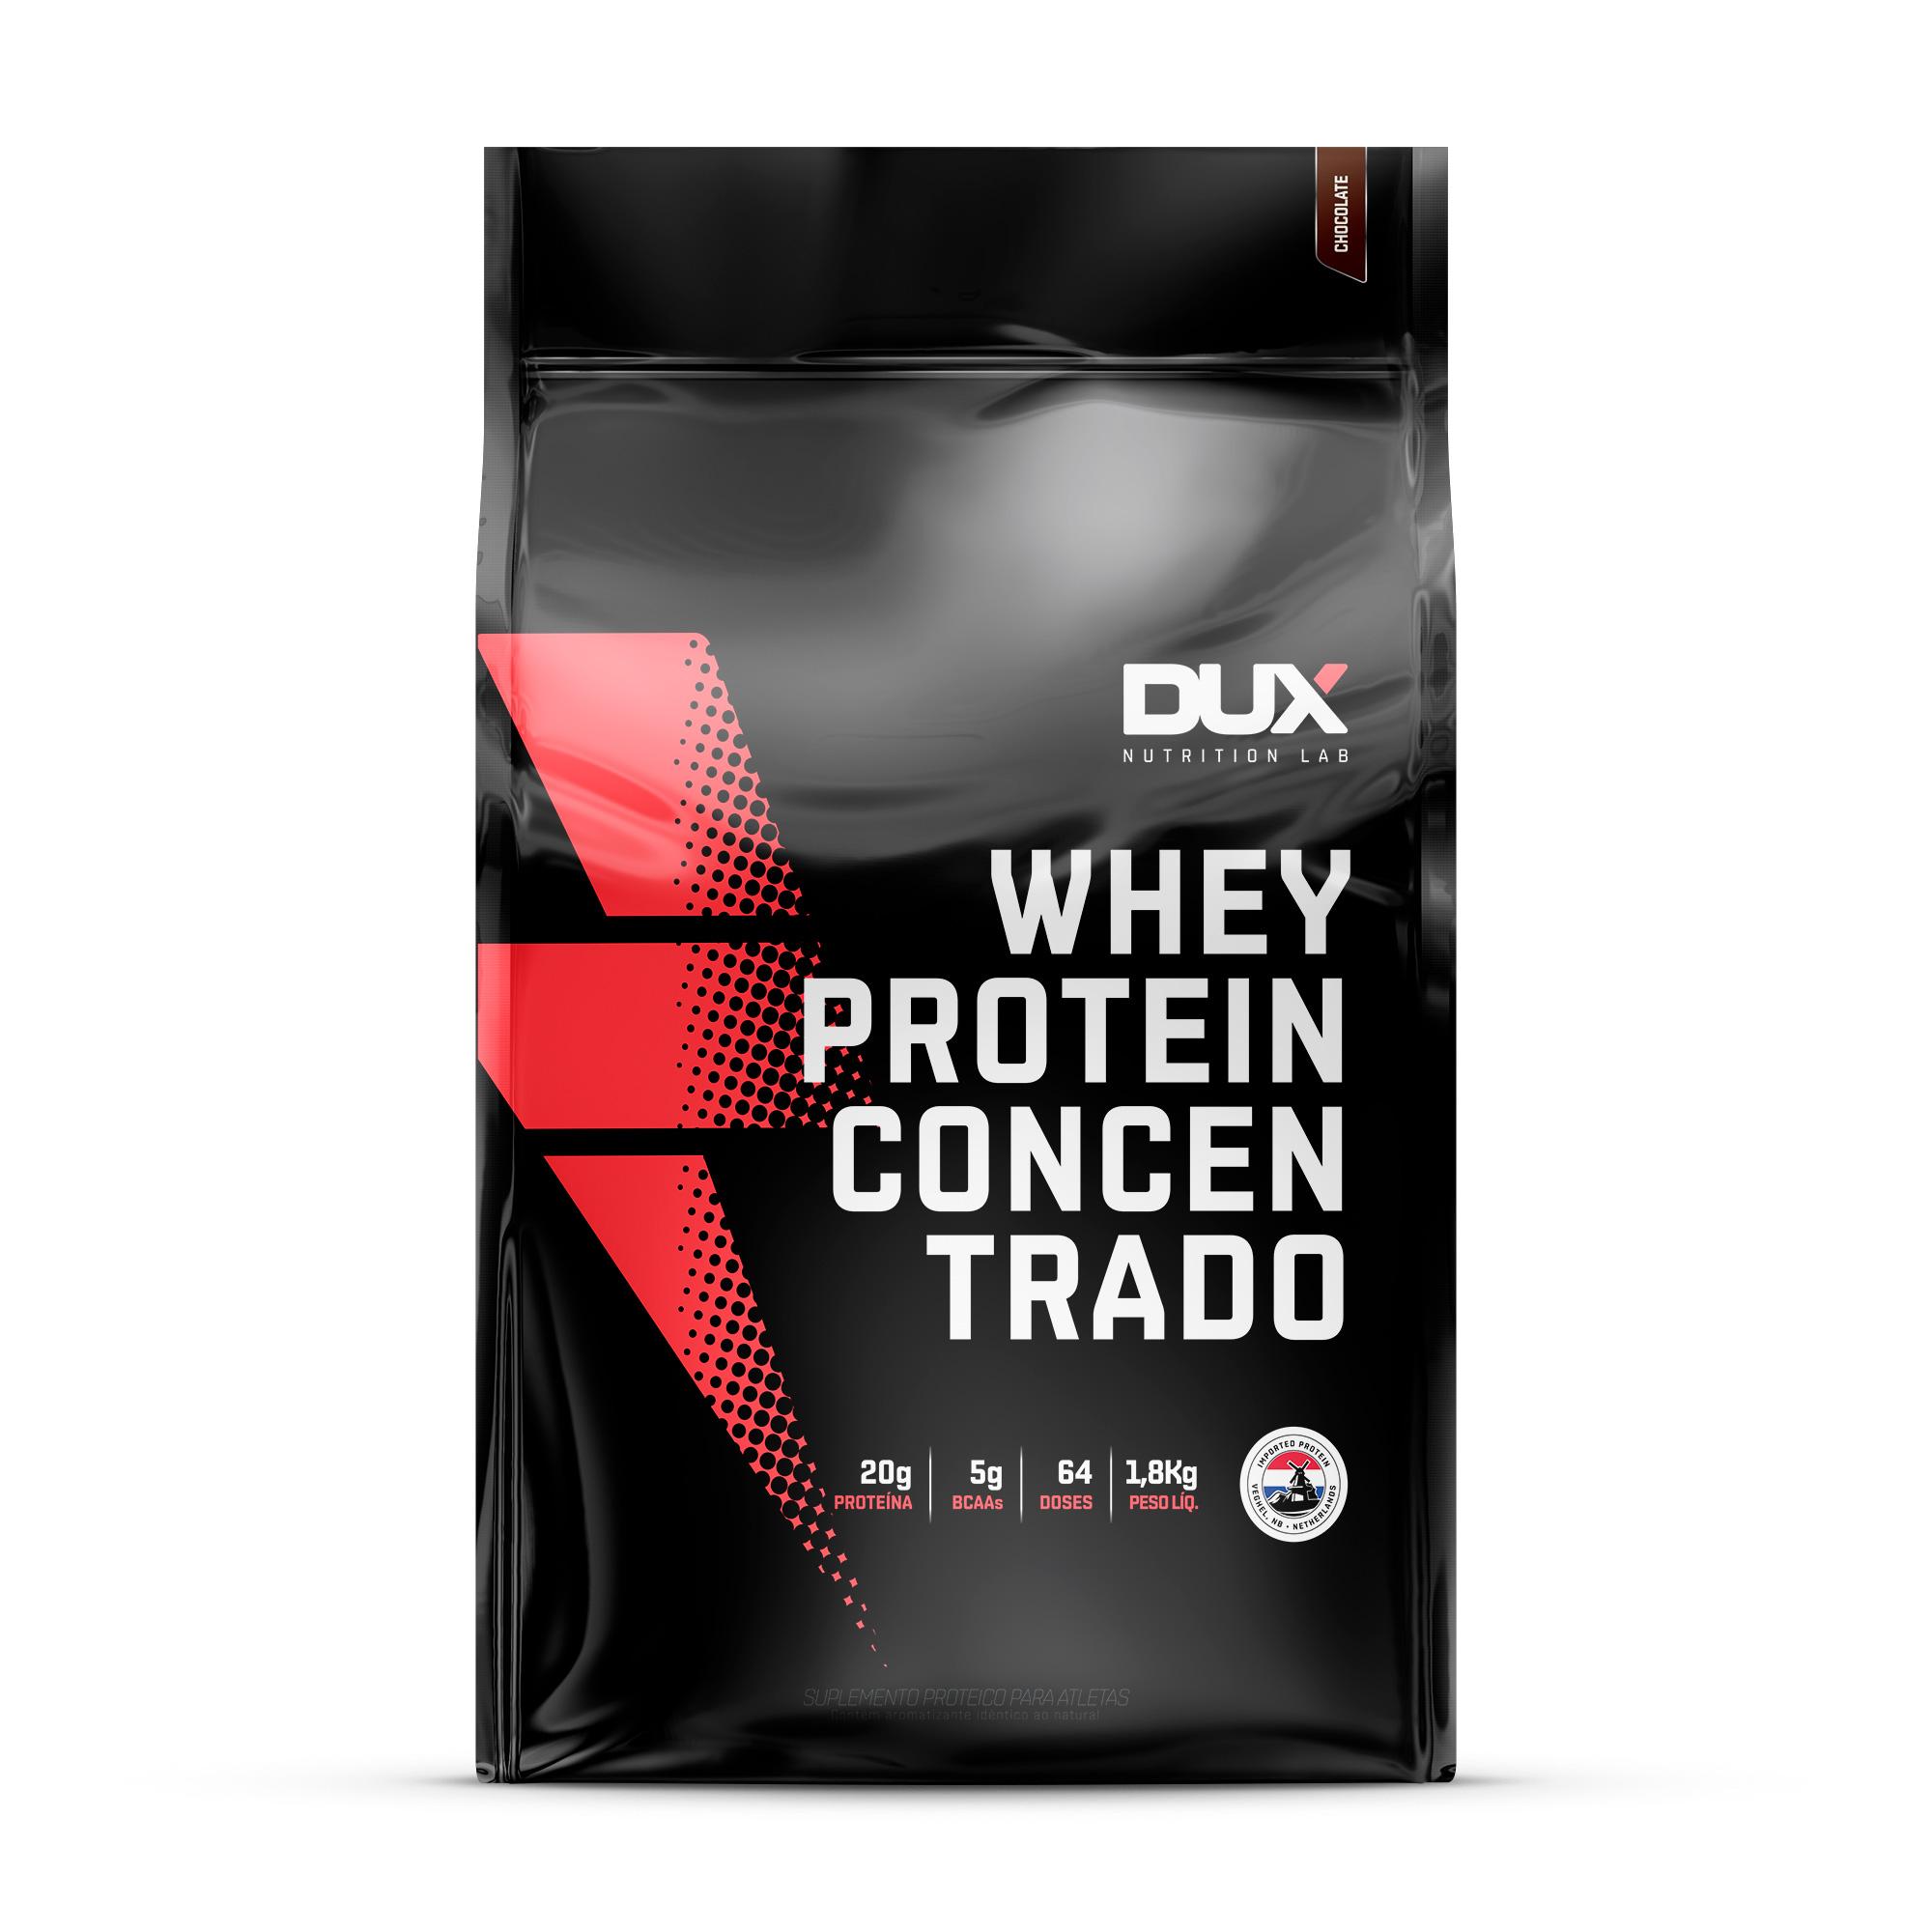 Whey Protein Concentrado 1,8kg Refil - Dux Nutrition